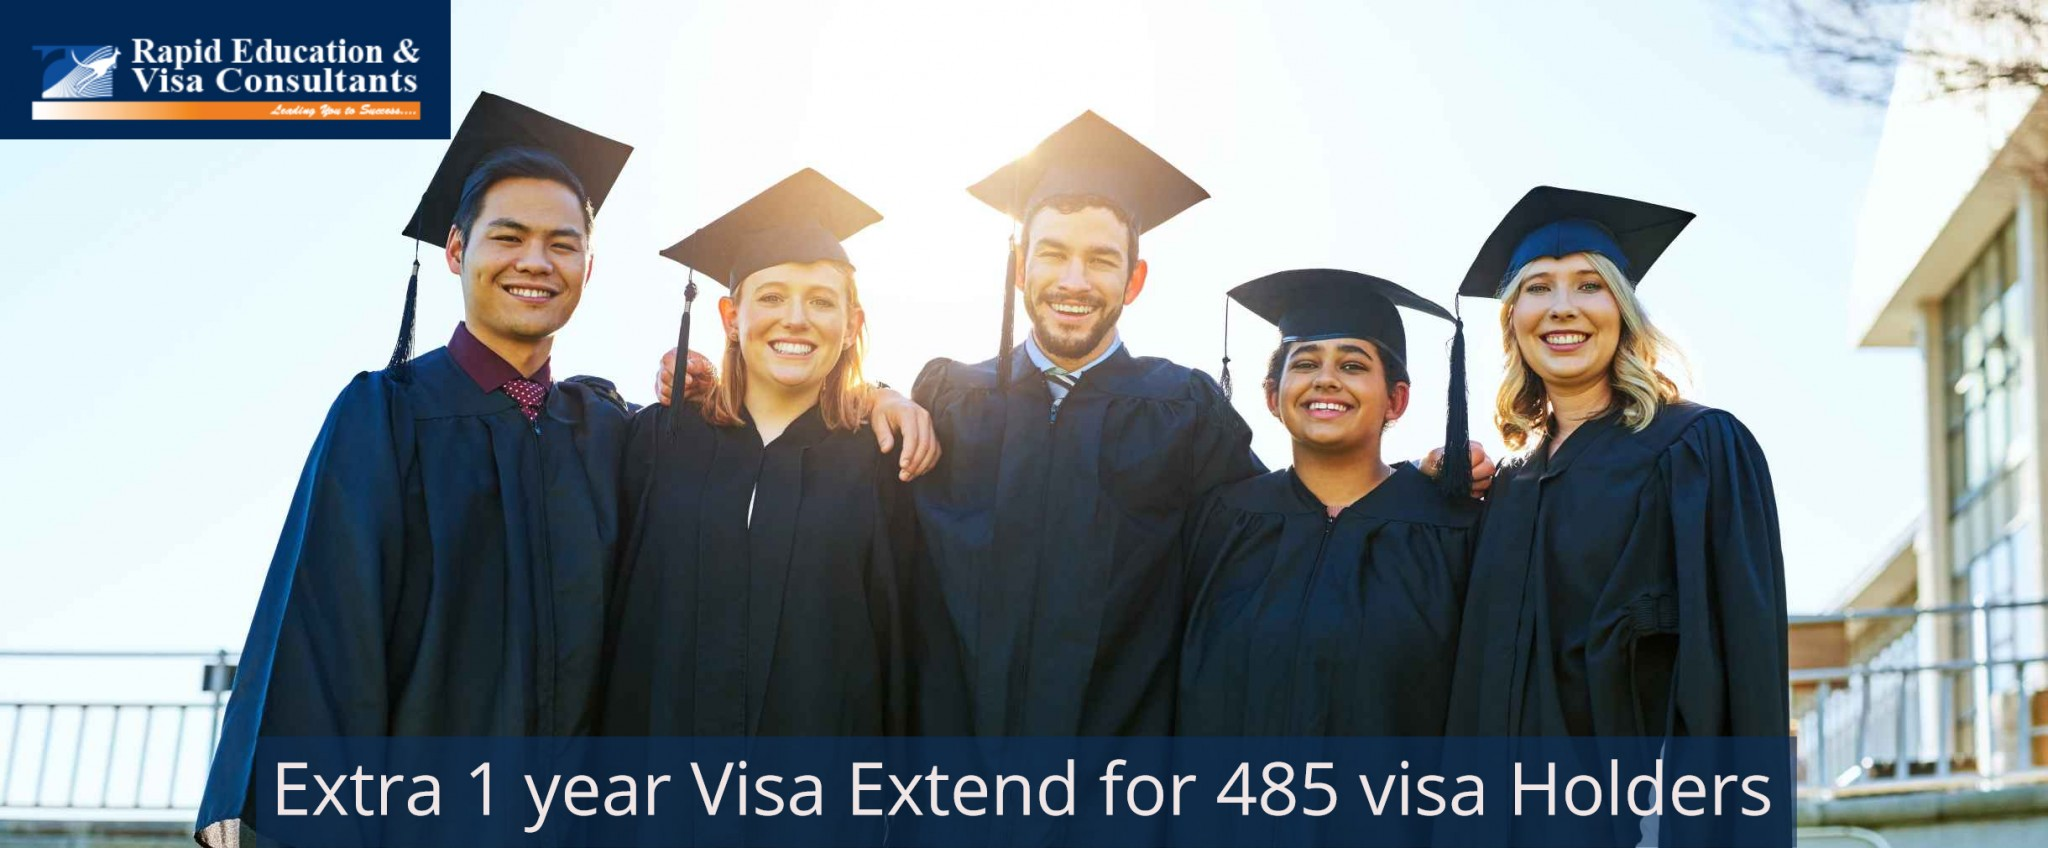 Extra 1 year visa extension